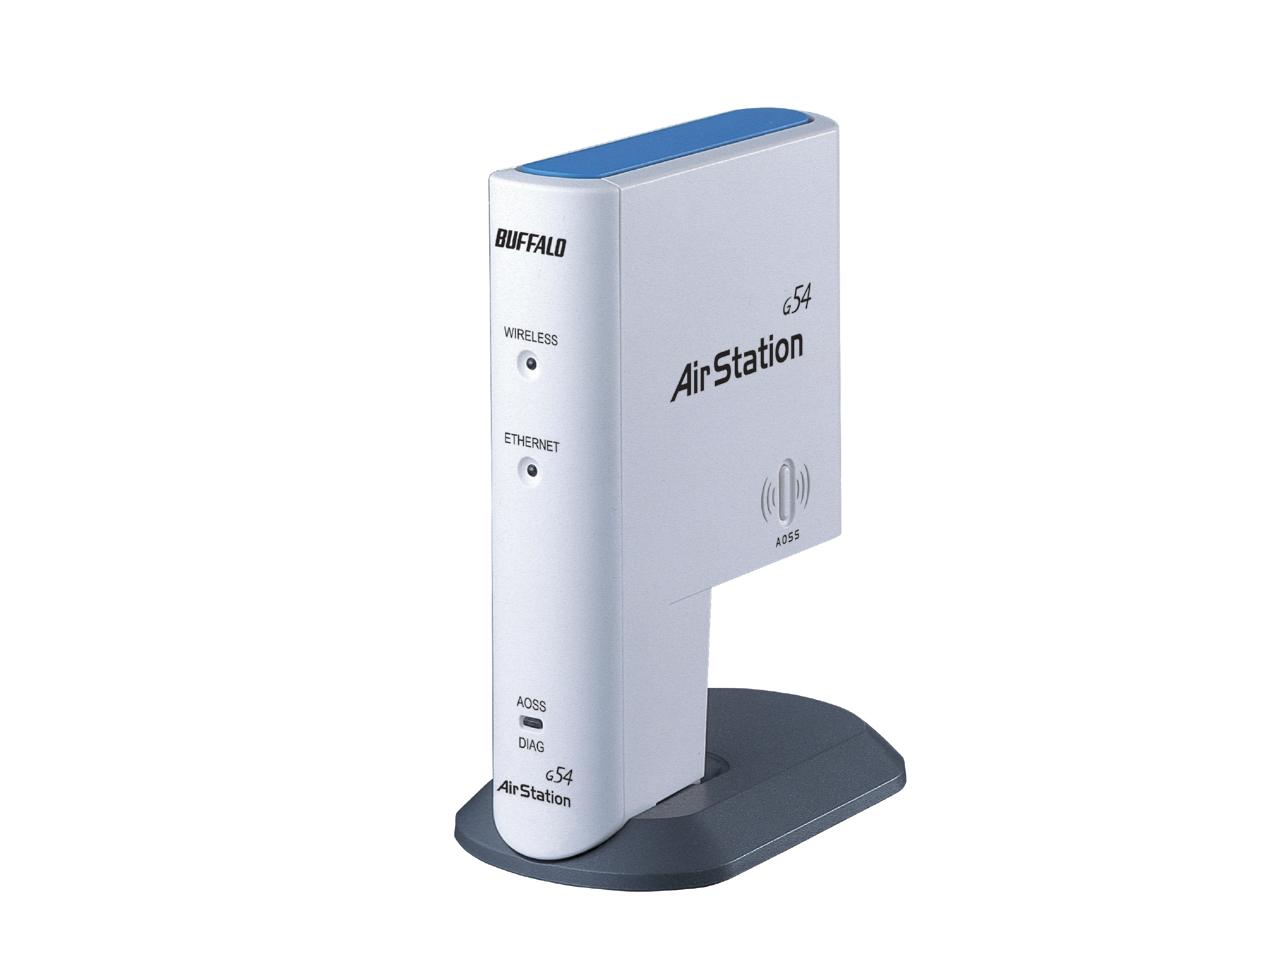 BUFFALO WLI2 USB2 G54 DRIVER FOR MAC DOWNLOAD